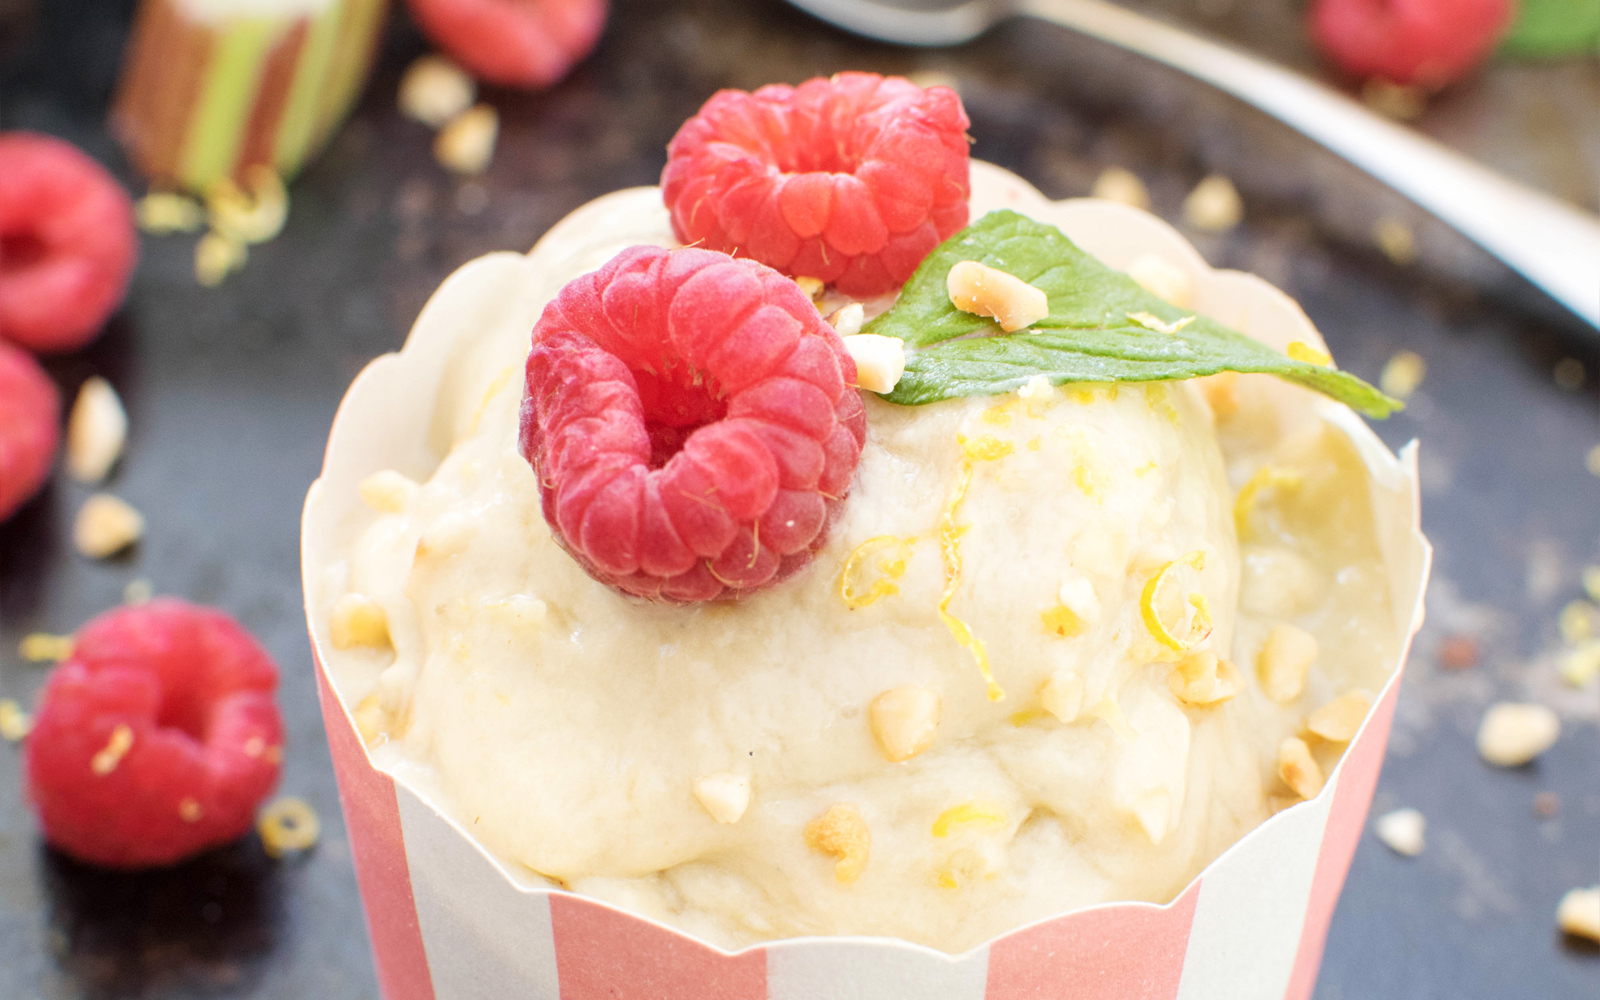 Rhubarb and Lemon Ice Cream v